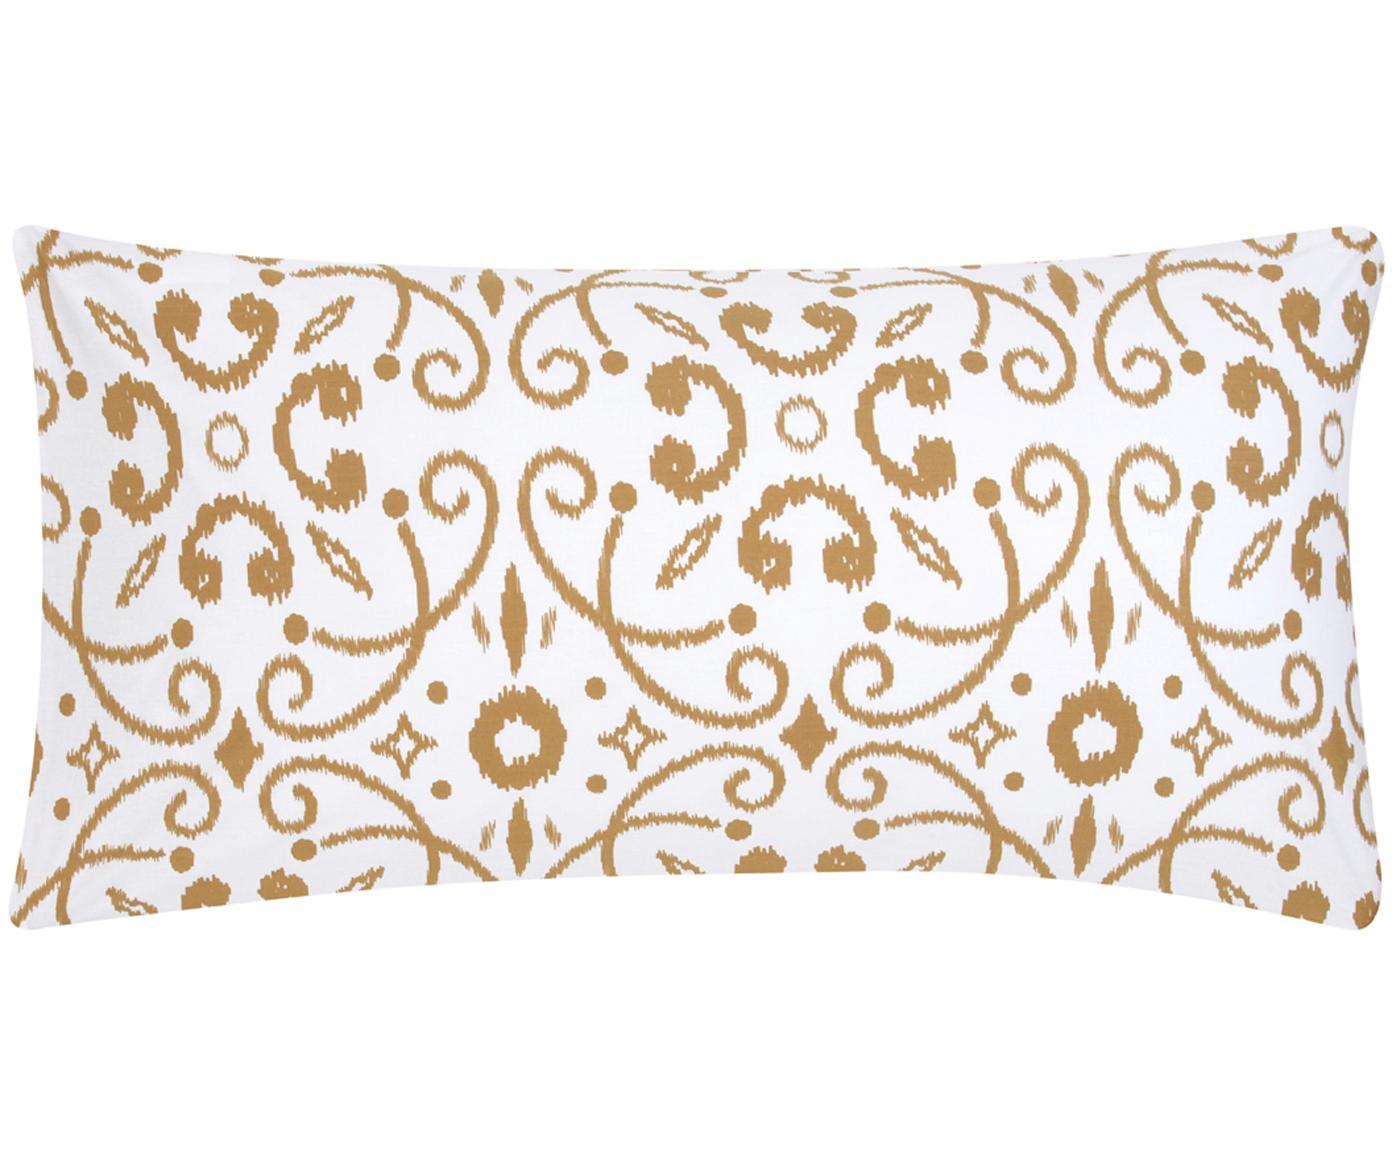 Baumwoll-Kissenbezüge Antje, 2 Stück, Webart: Renforcé, Weiß, Senfgelb, 40 x 80 cm